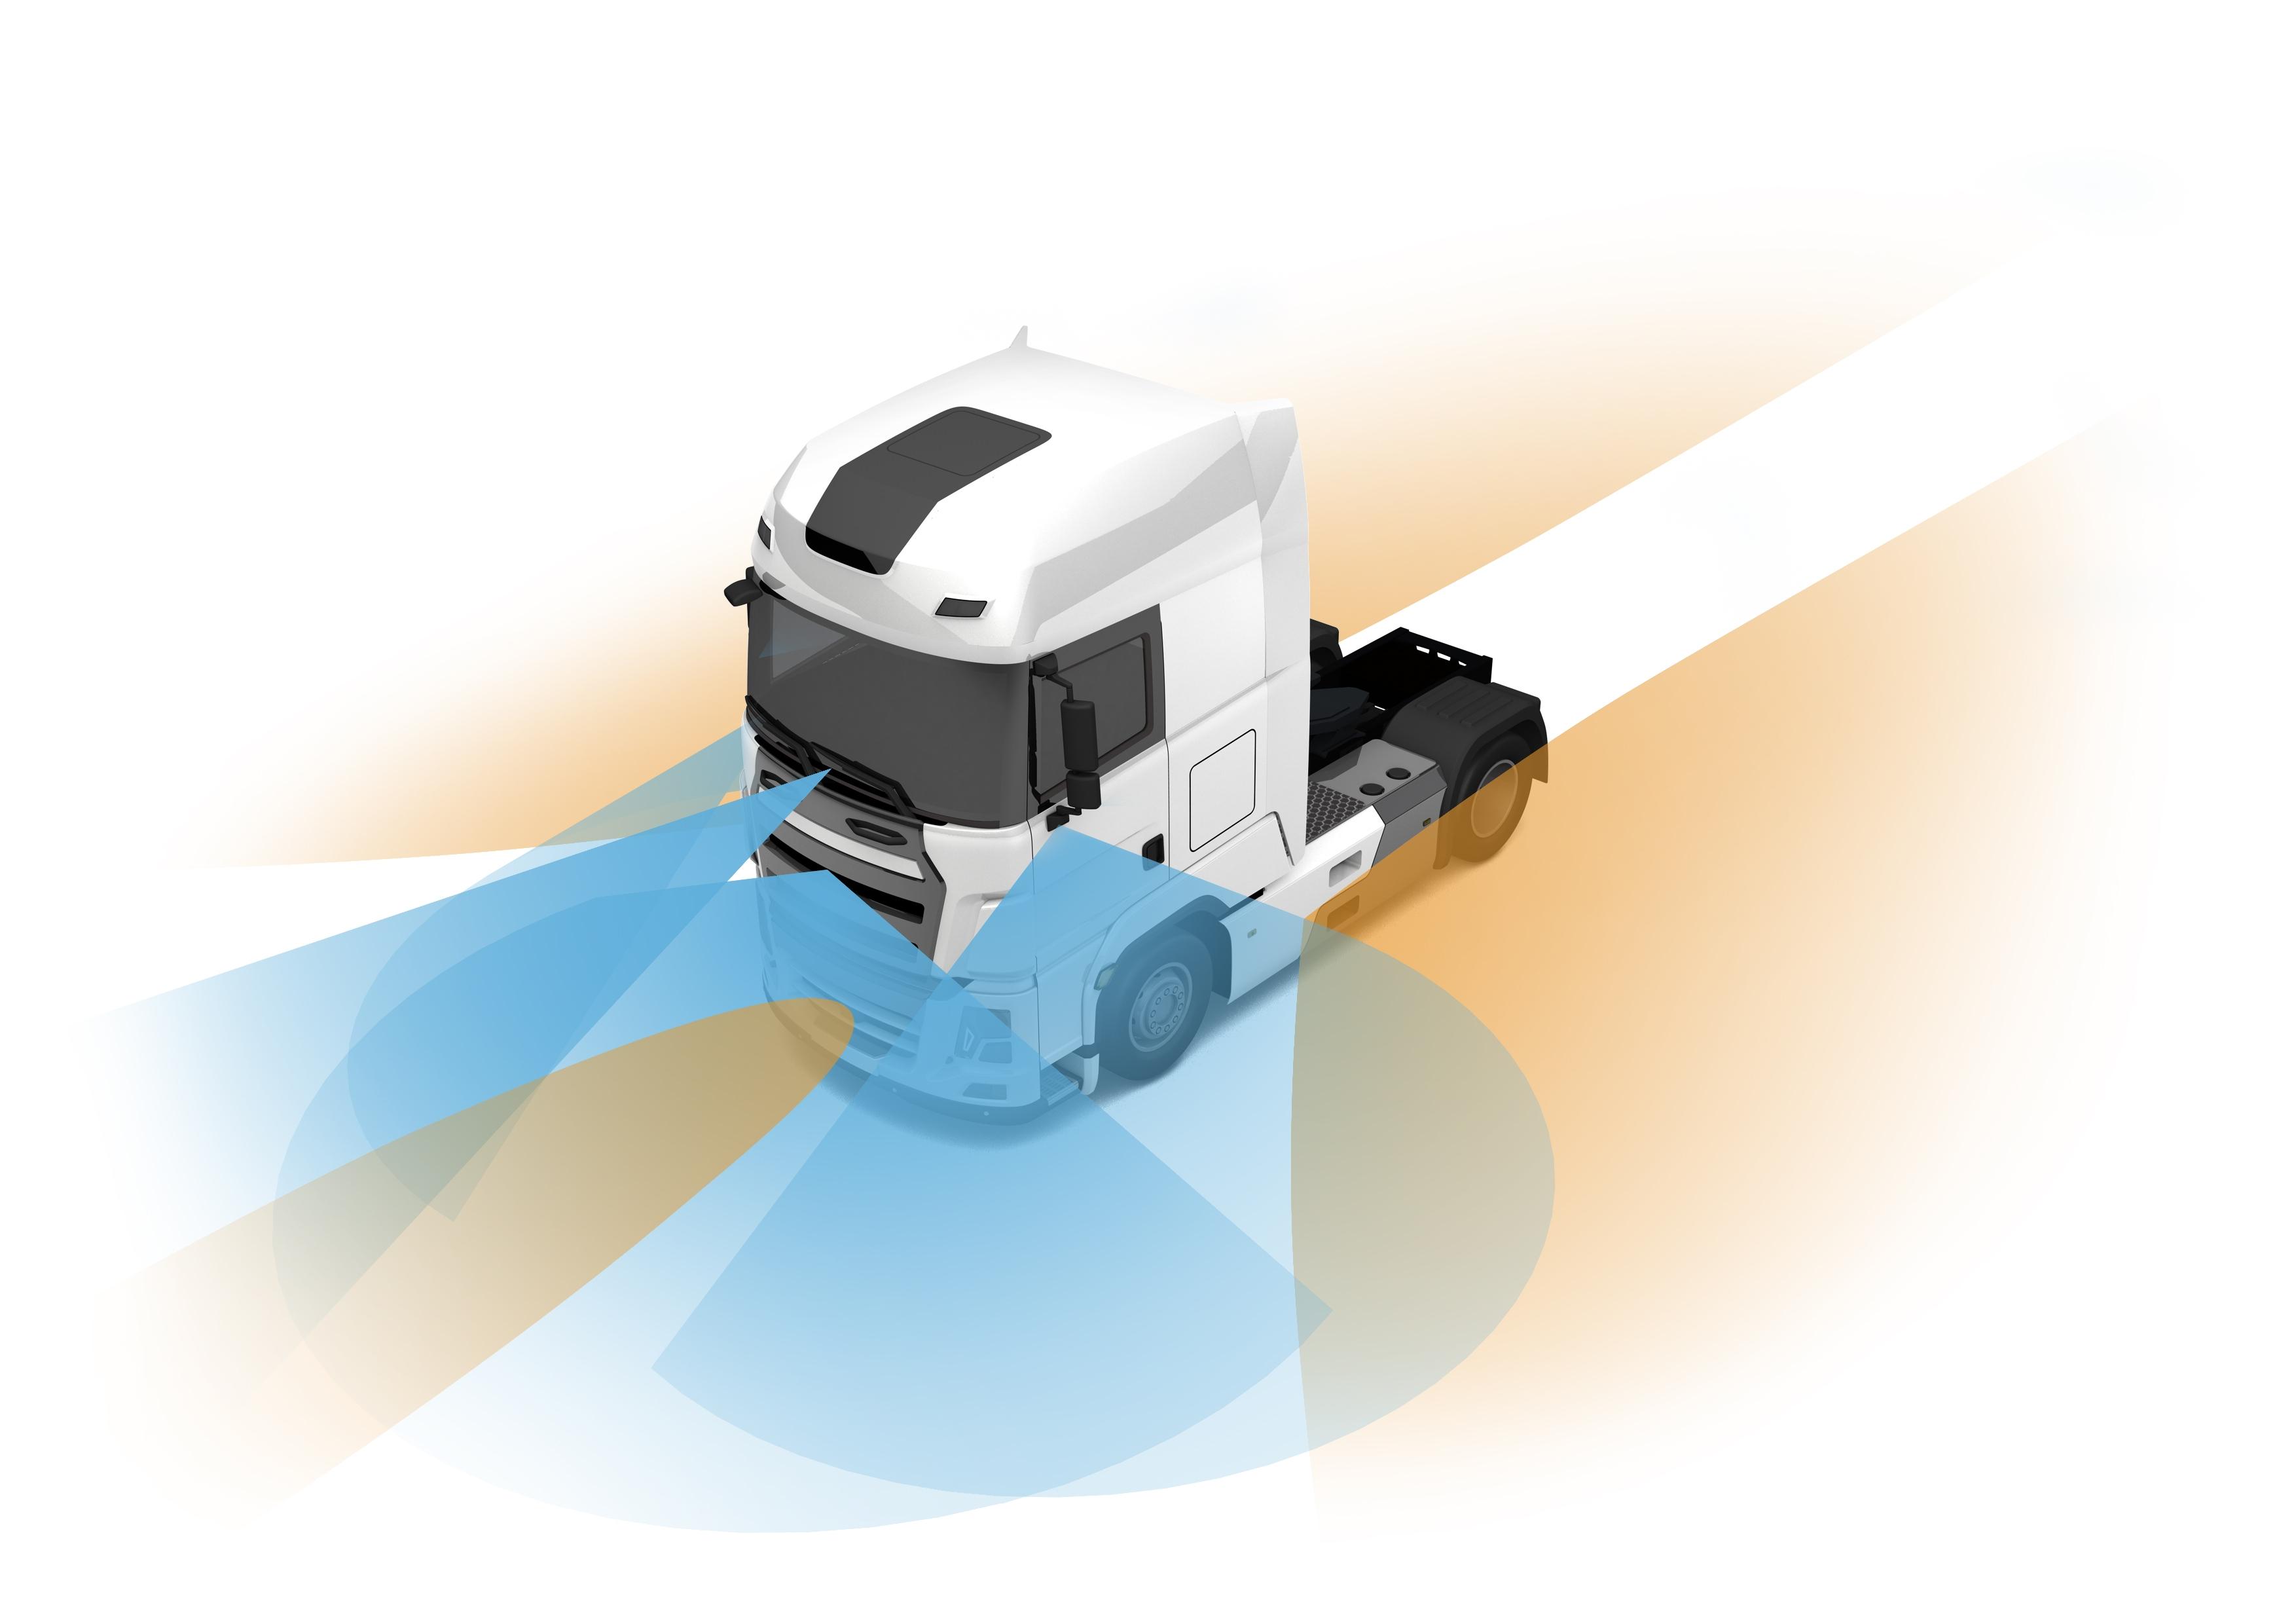 Projektfahrzeug mit Sensorfeld (Entwurf der IAV GmbH)